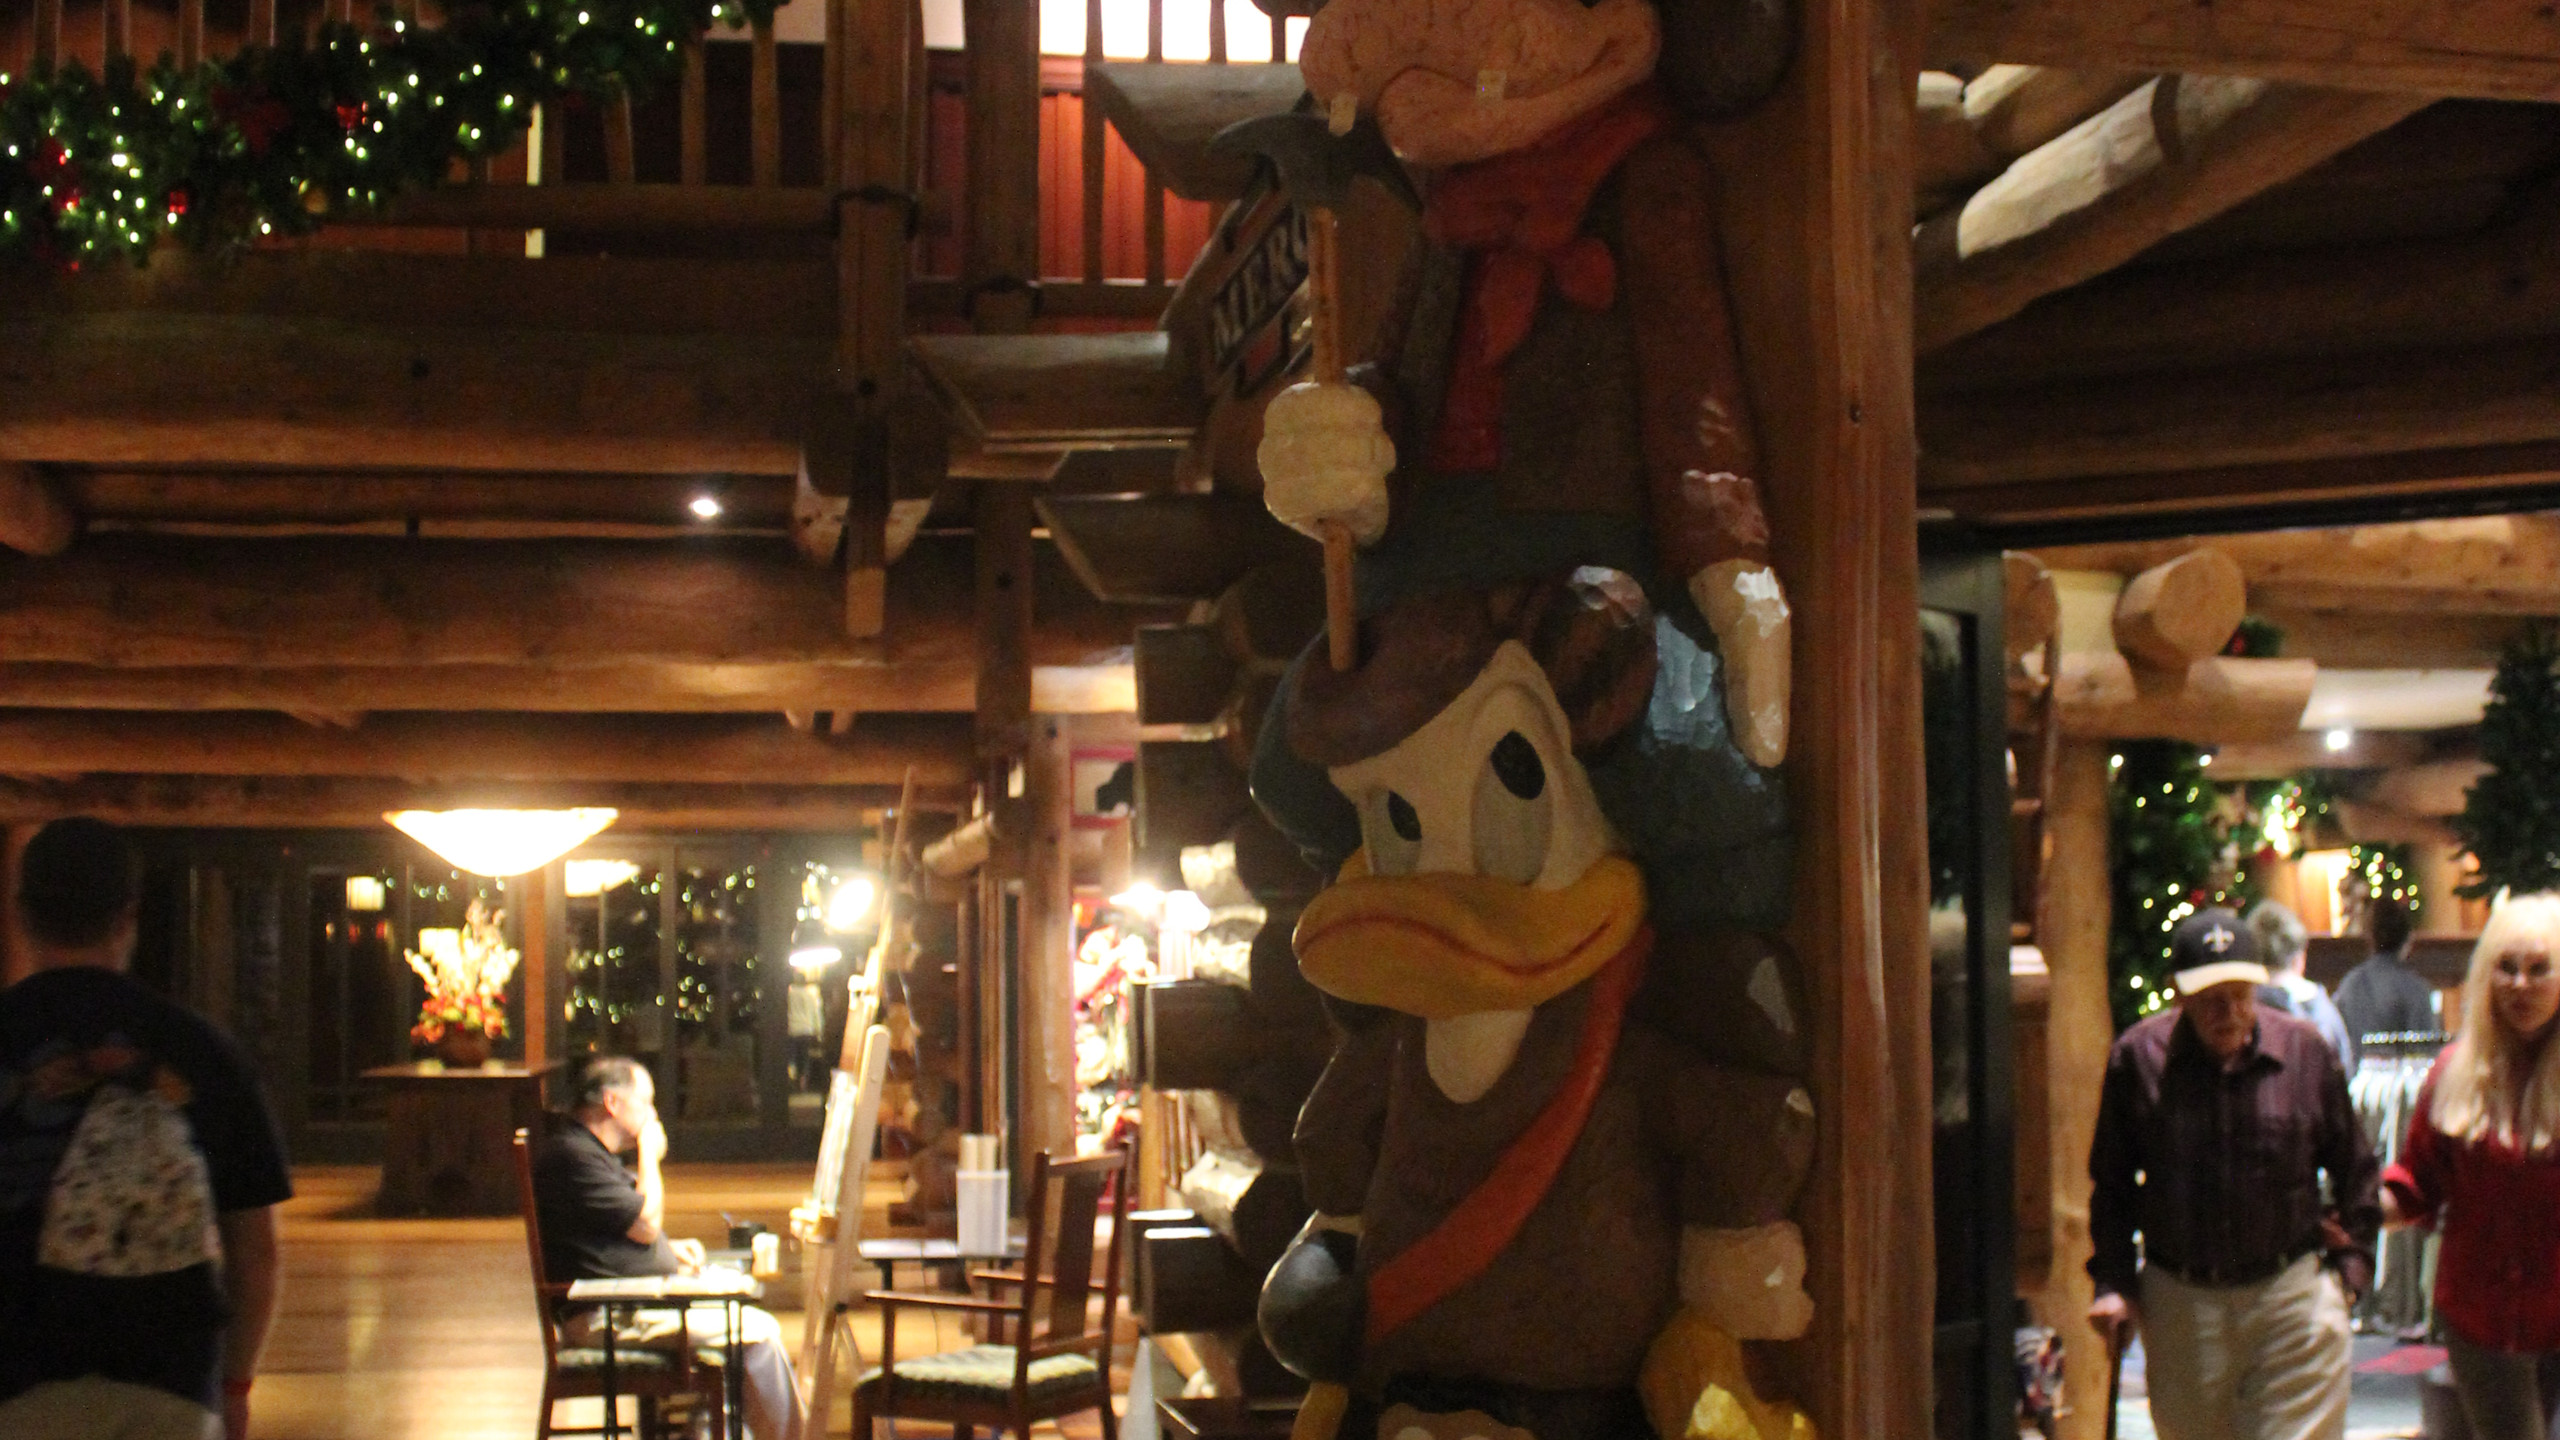 Totem pole at Disney's Wilderness Lodge in Orlando, FL